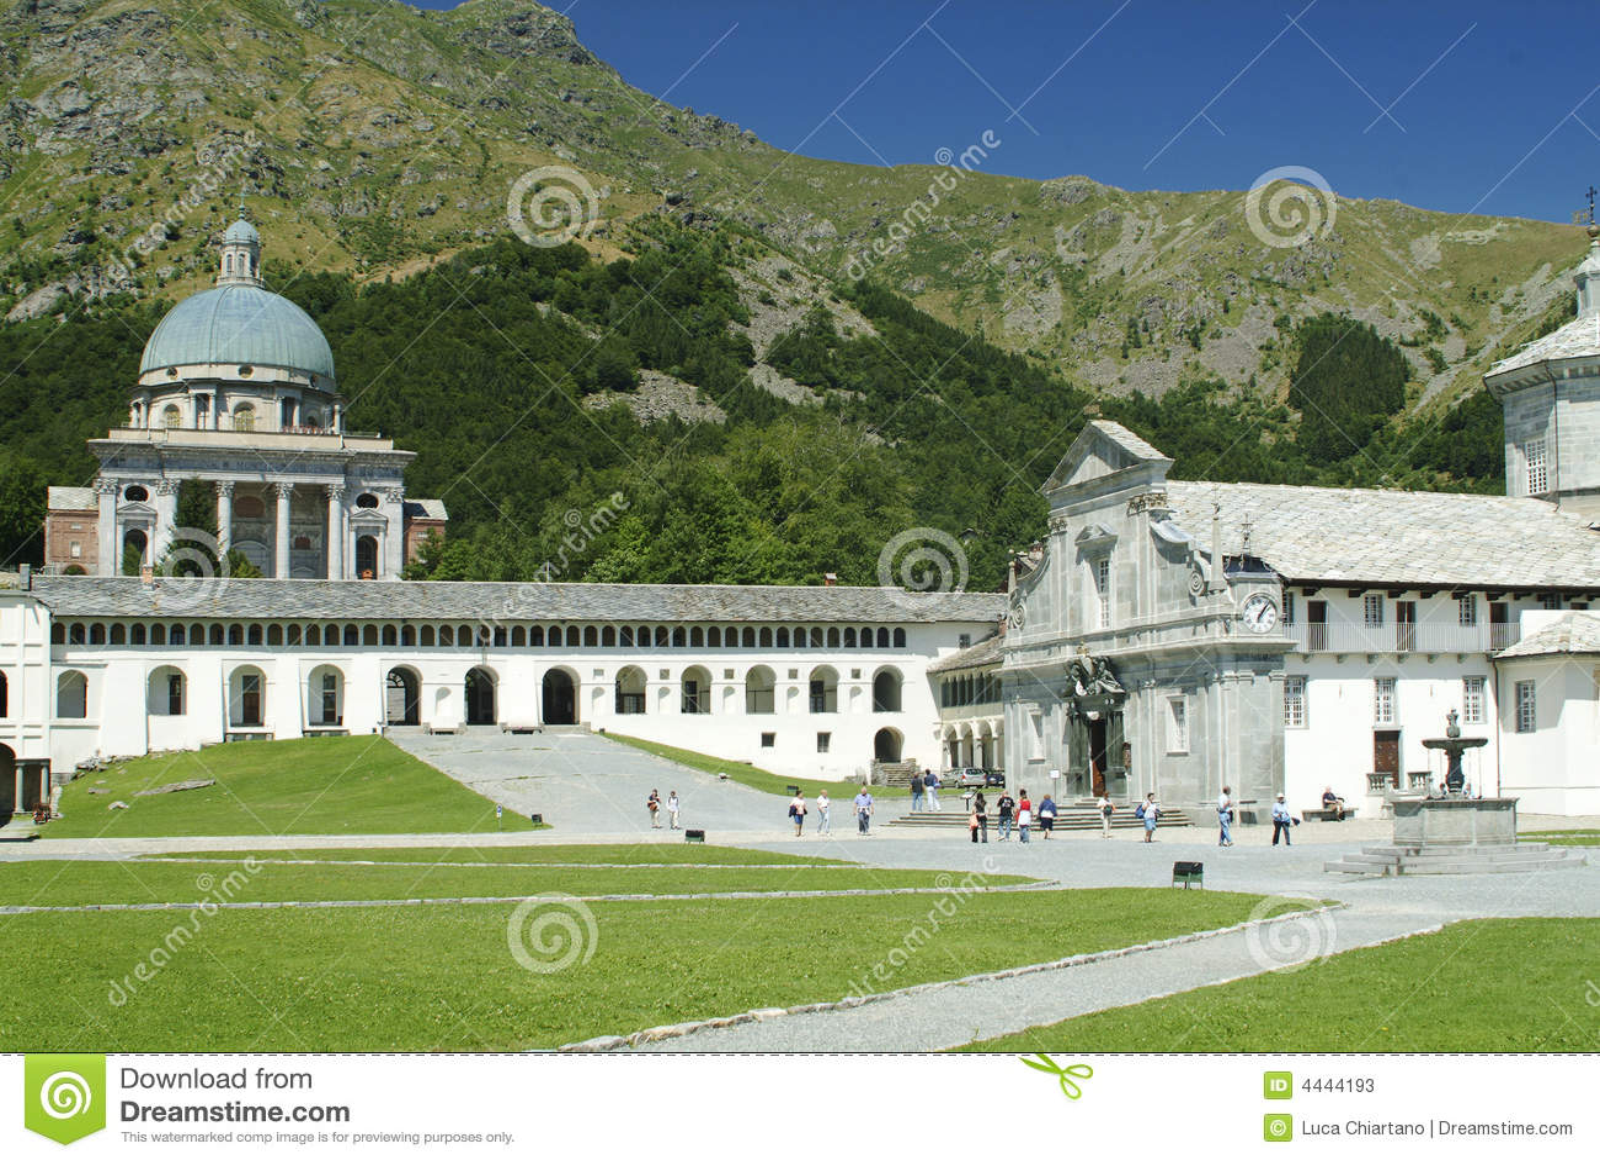 Biella Italy  City pictures : Sanctuary Of Oropa Biella Italy Stock Photos Image: 4444193